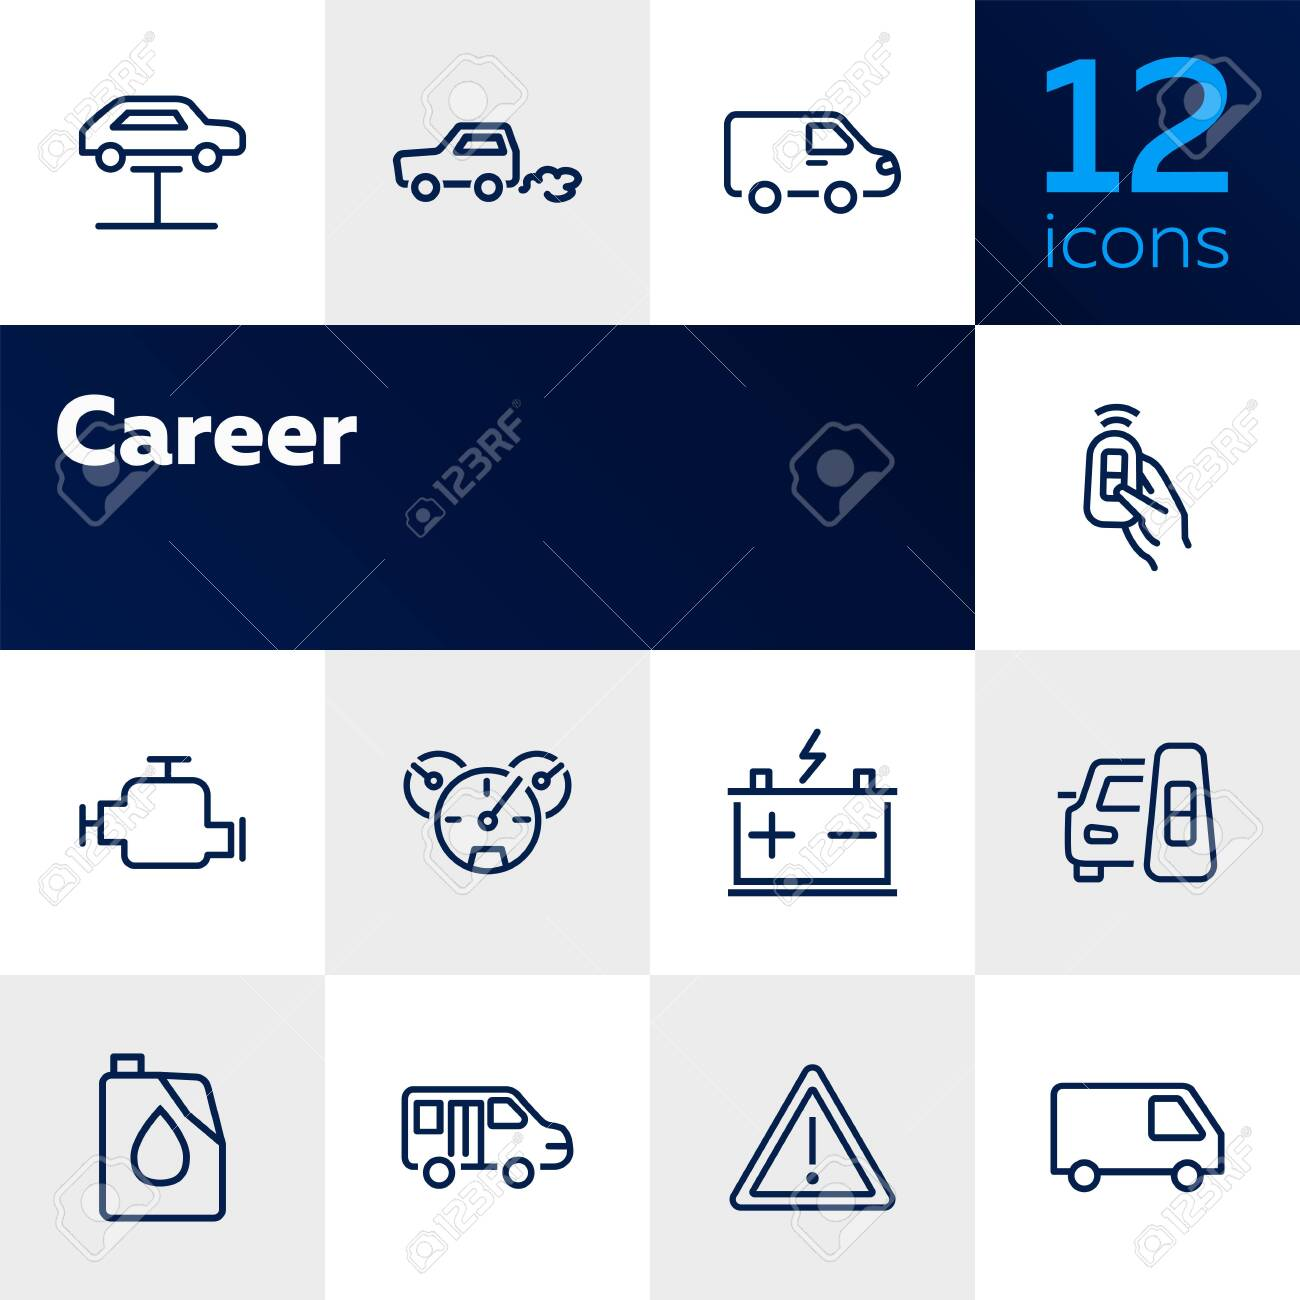 Car service line icon set  Lift, battery, van, key  Car concept